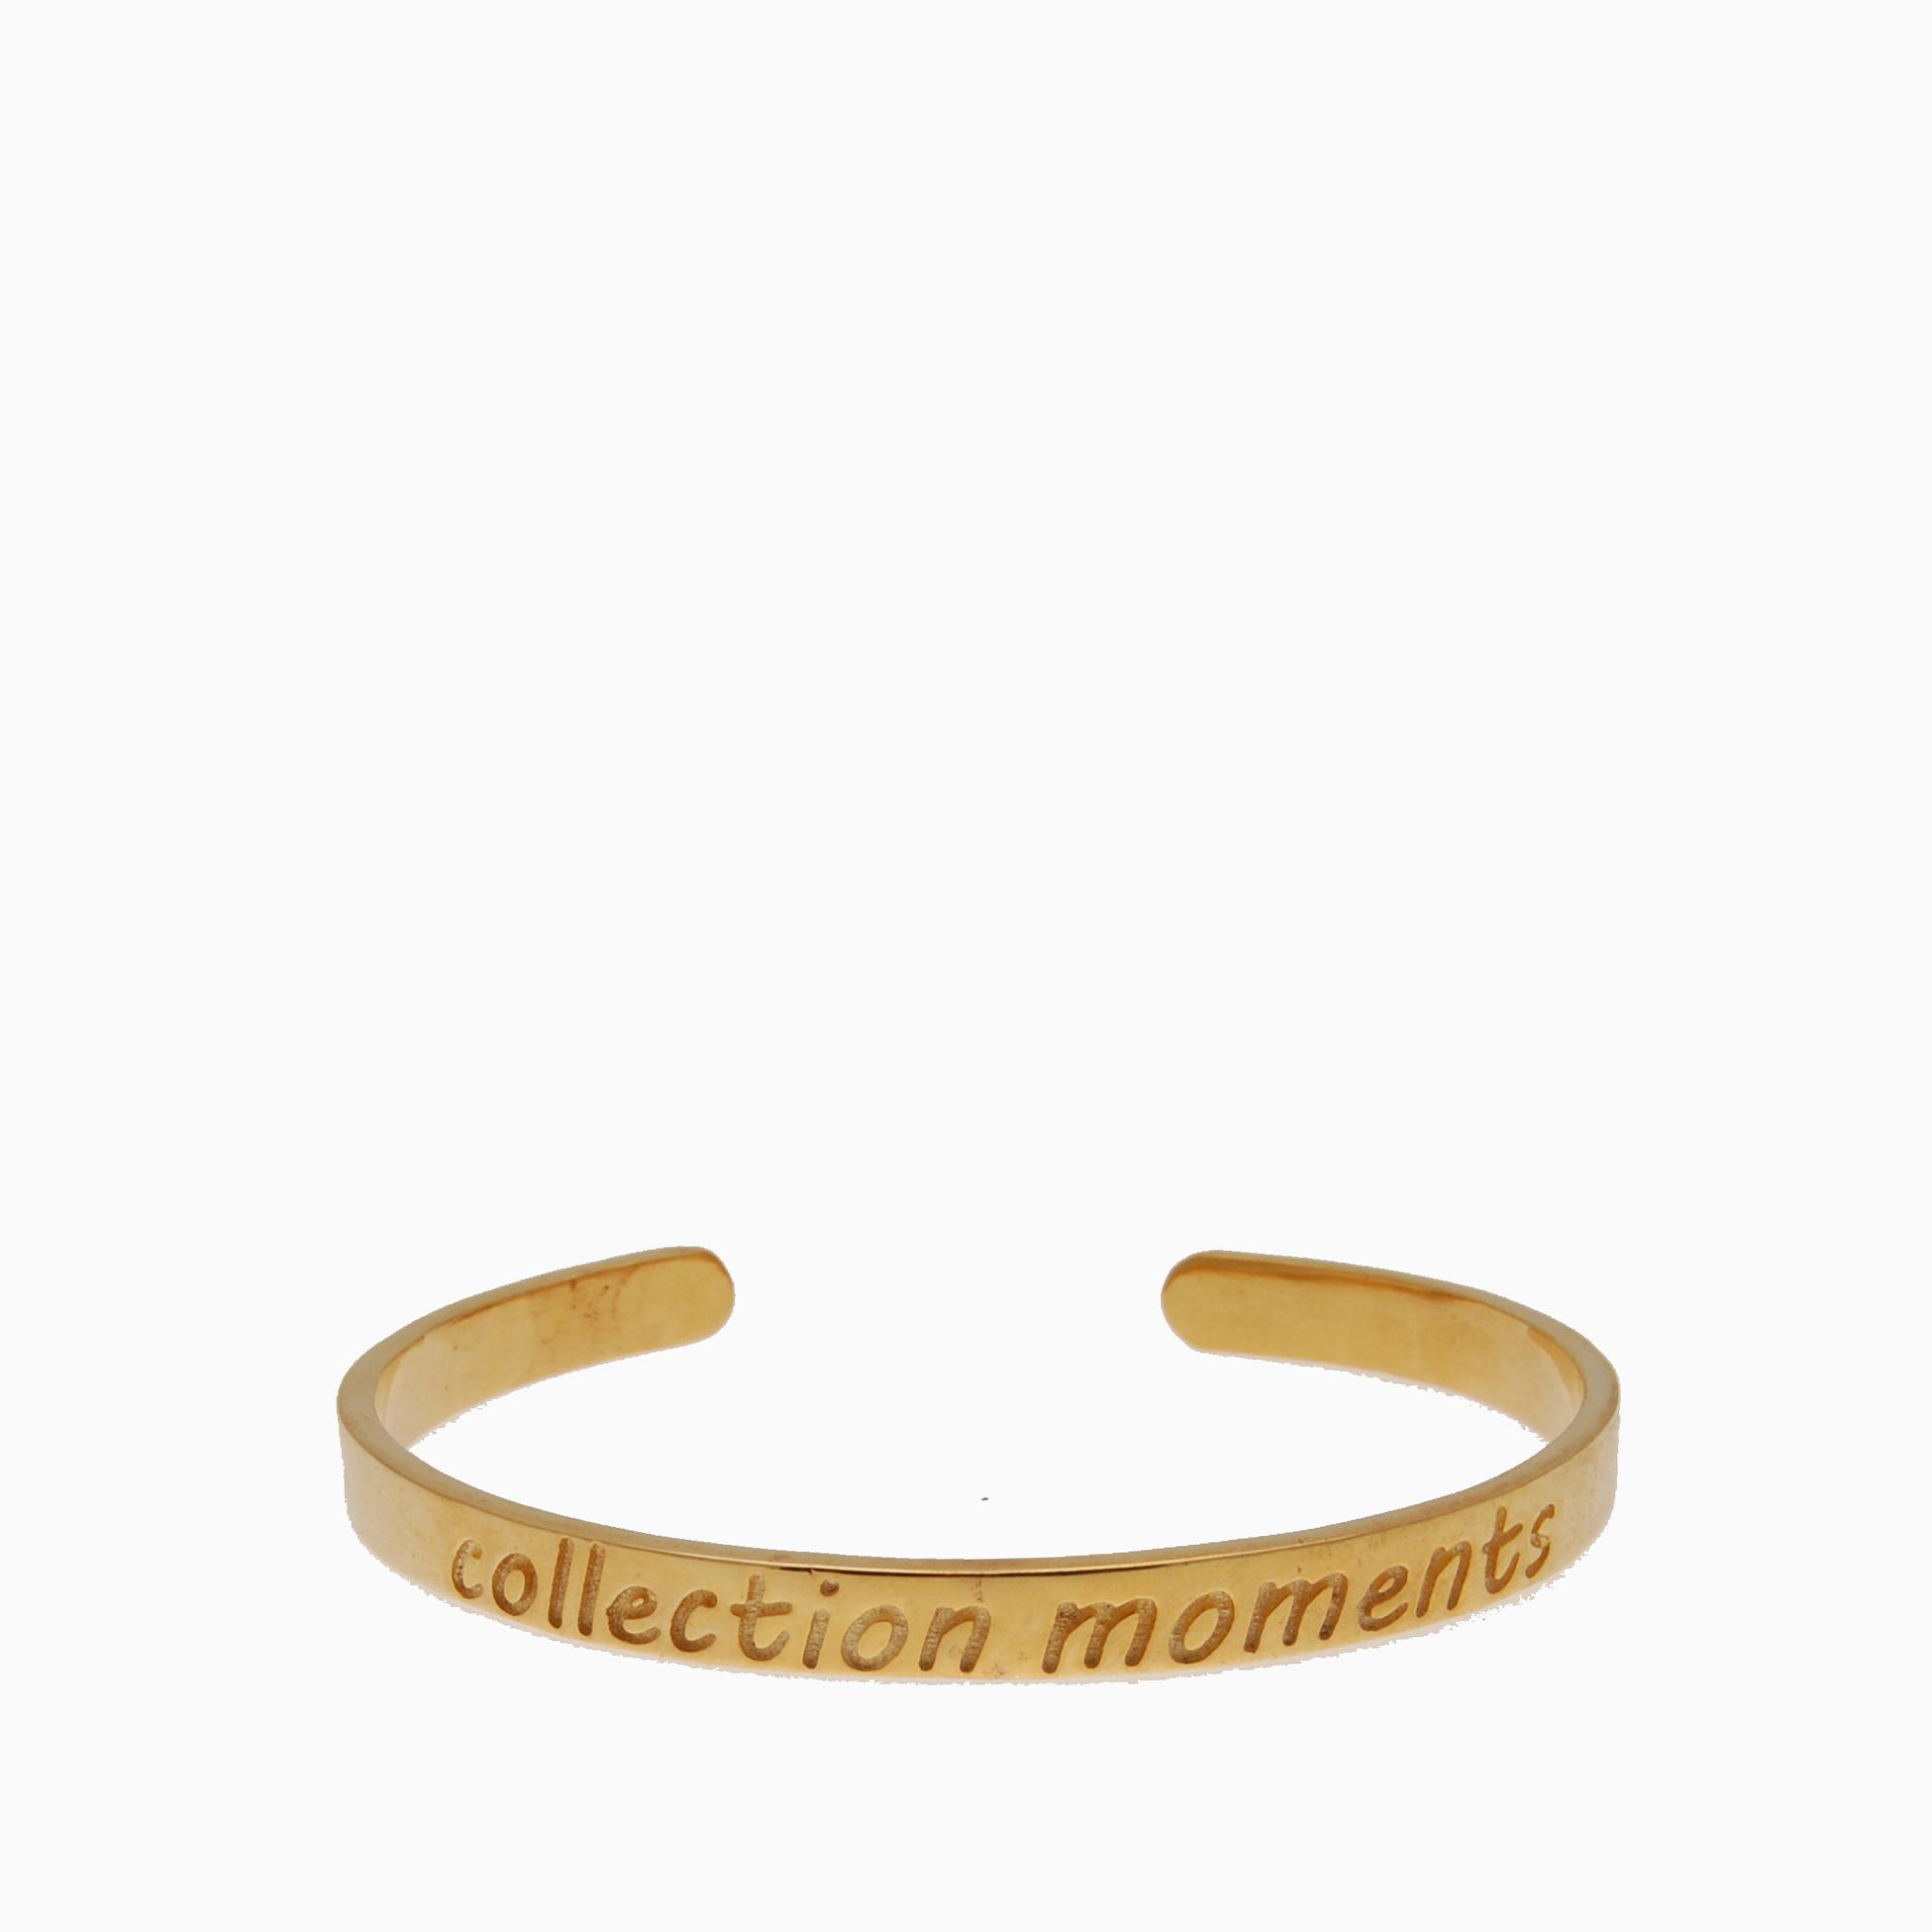 Armbånd guldbelagt med statement | no. A3